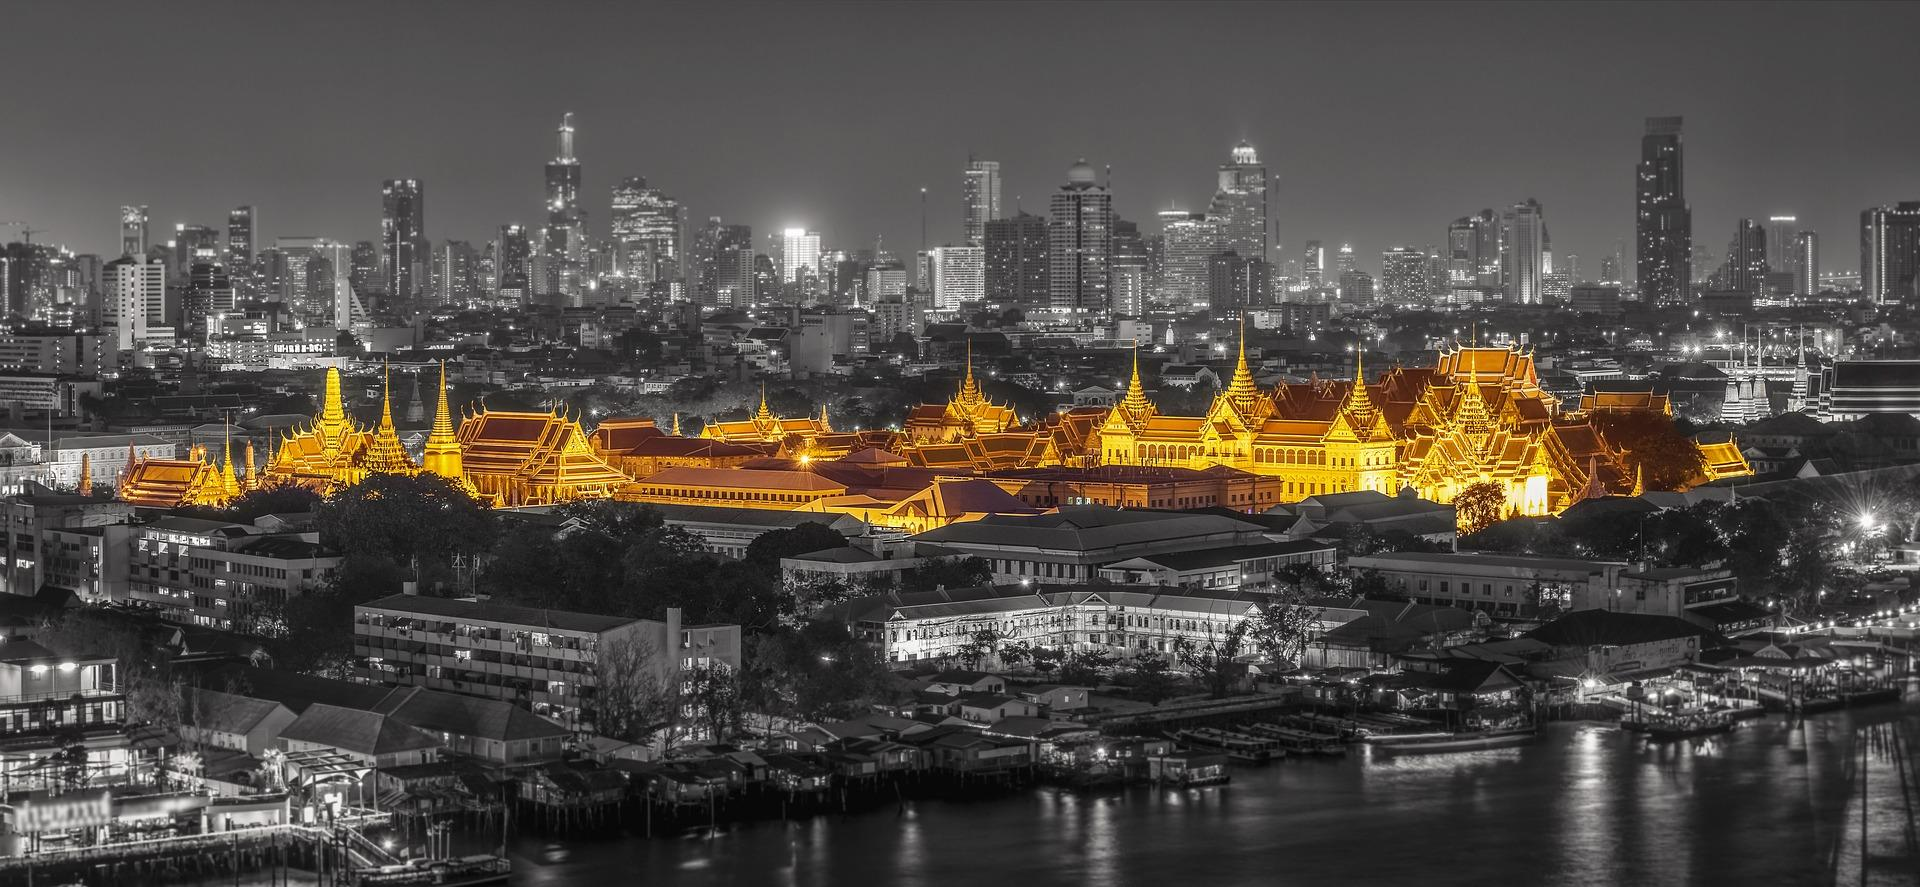 bangkok 1807480 1920 - Milénium, tisíciletá říše